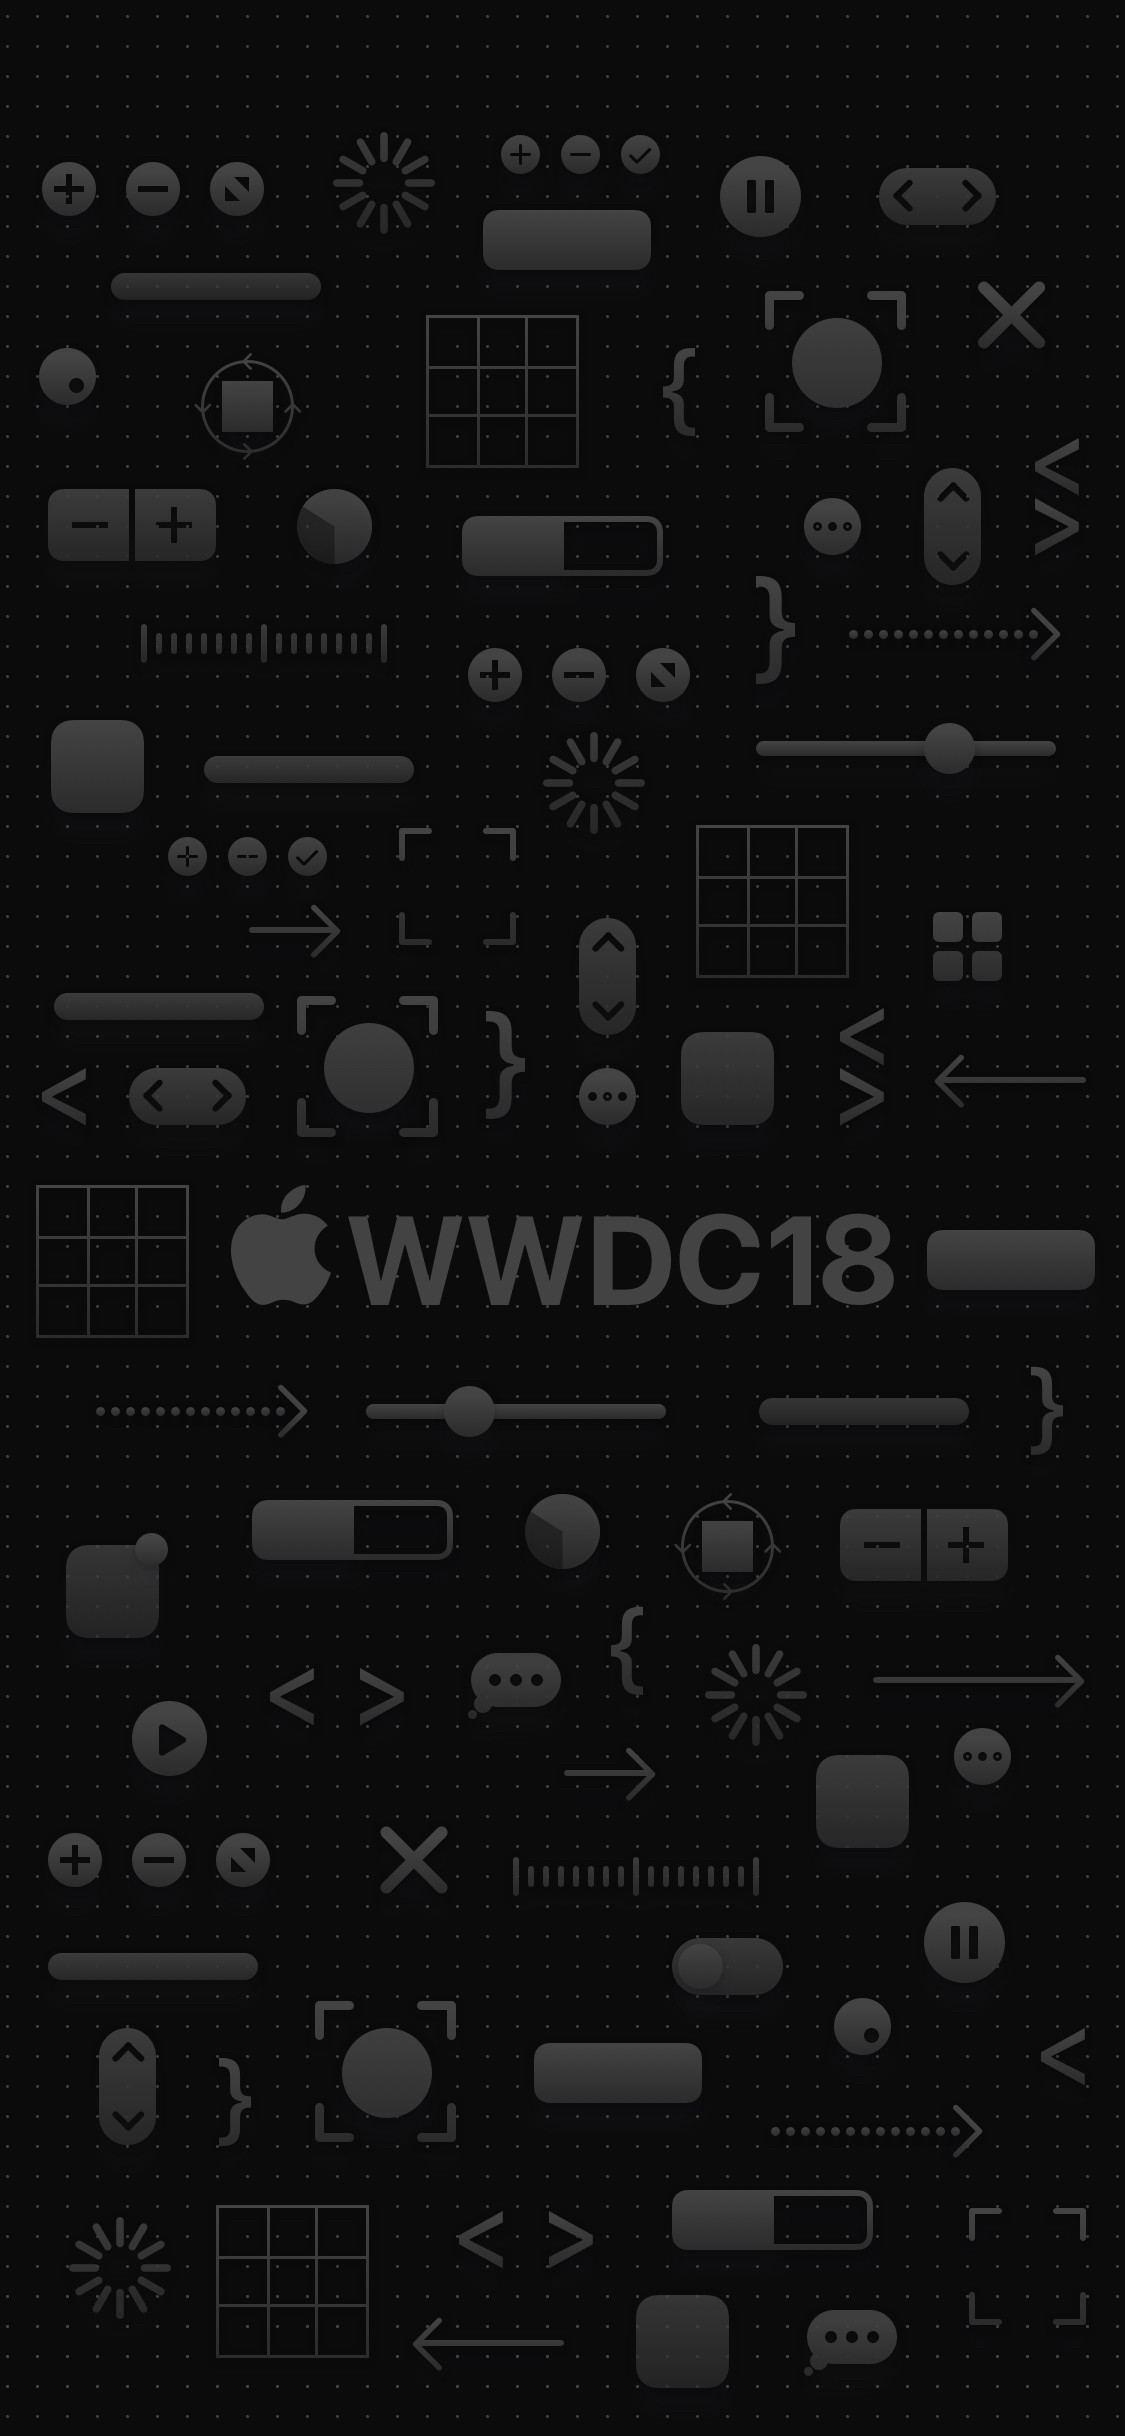 WWDC 2018 iPhone X